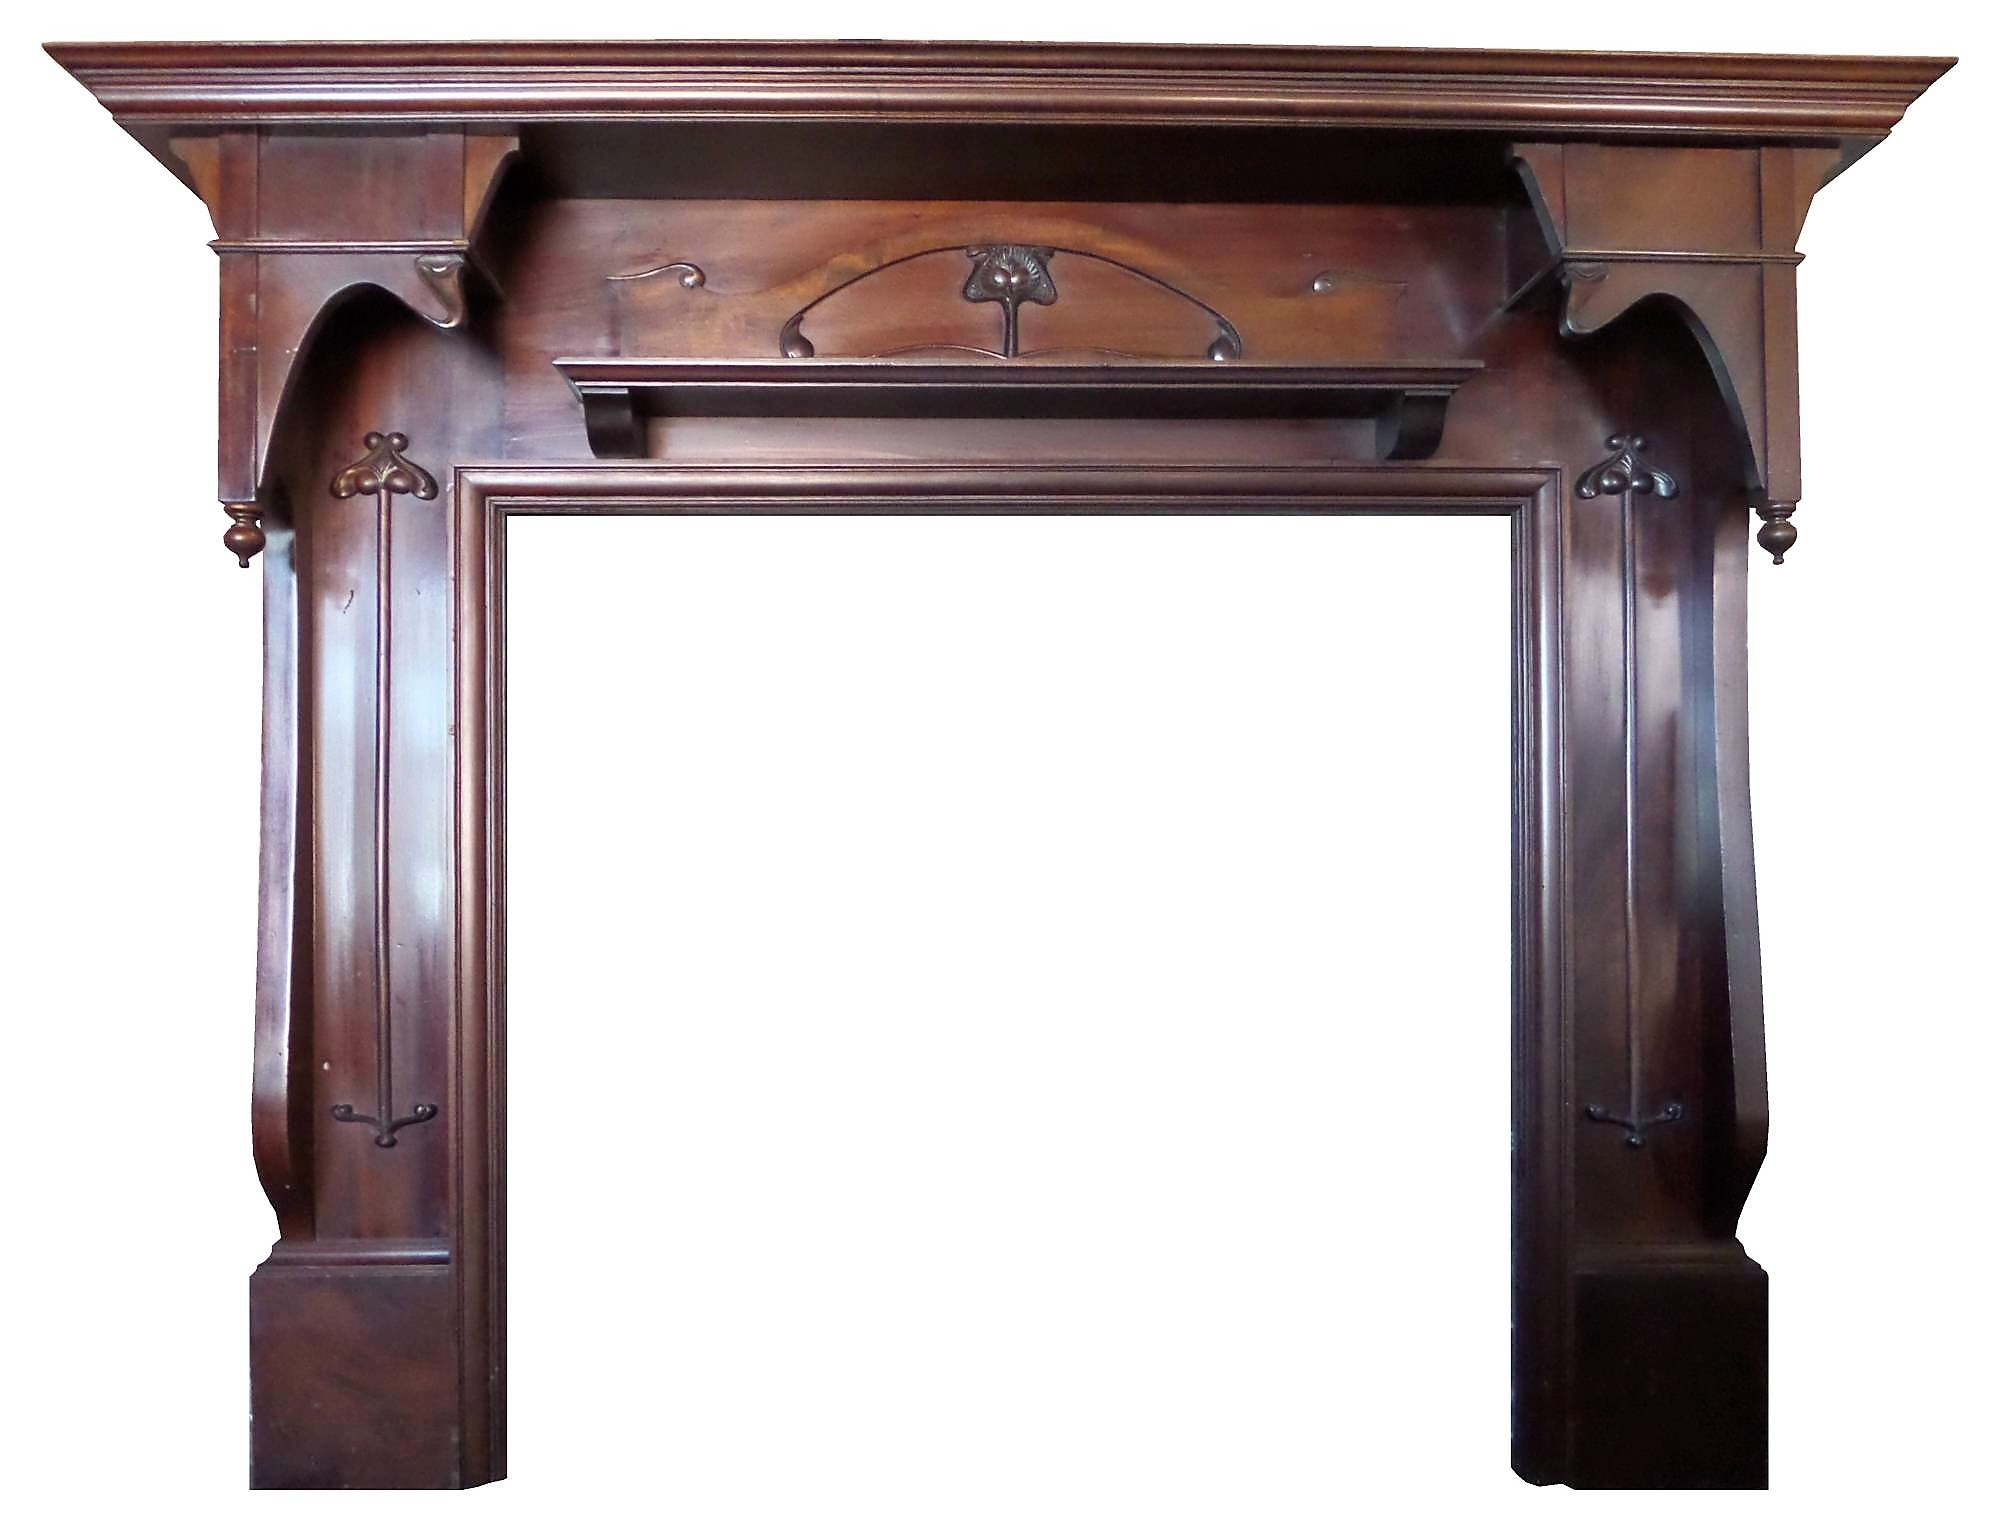 antique large mahogany art nouveau wood fireplace mantel surround